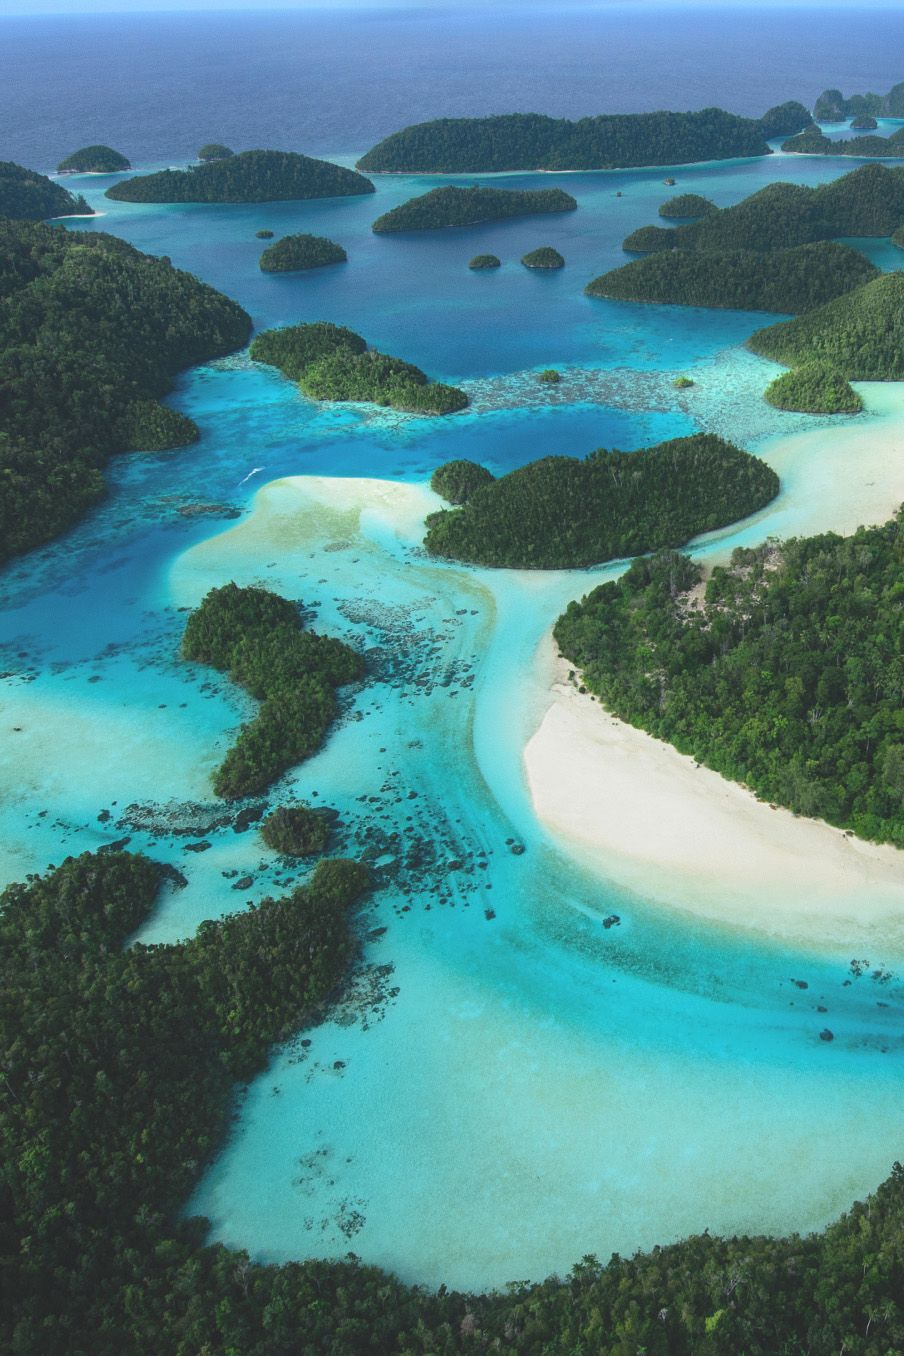 Wayag Island Group by Mike Veitch